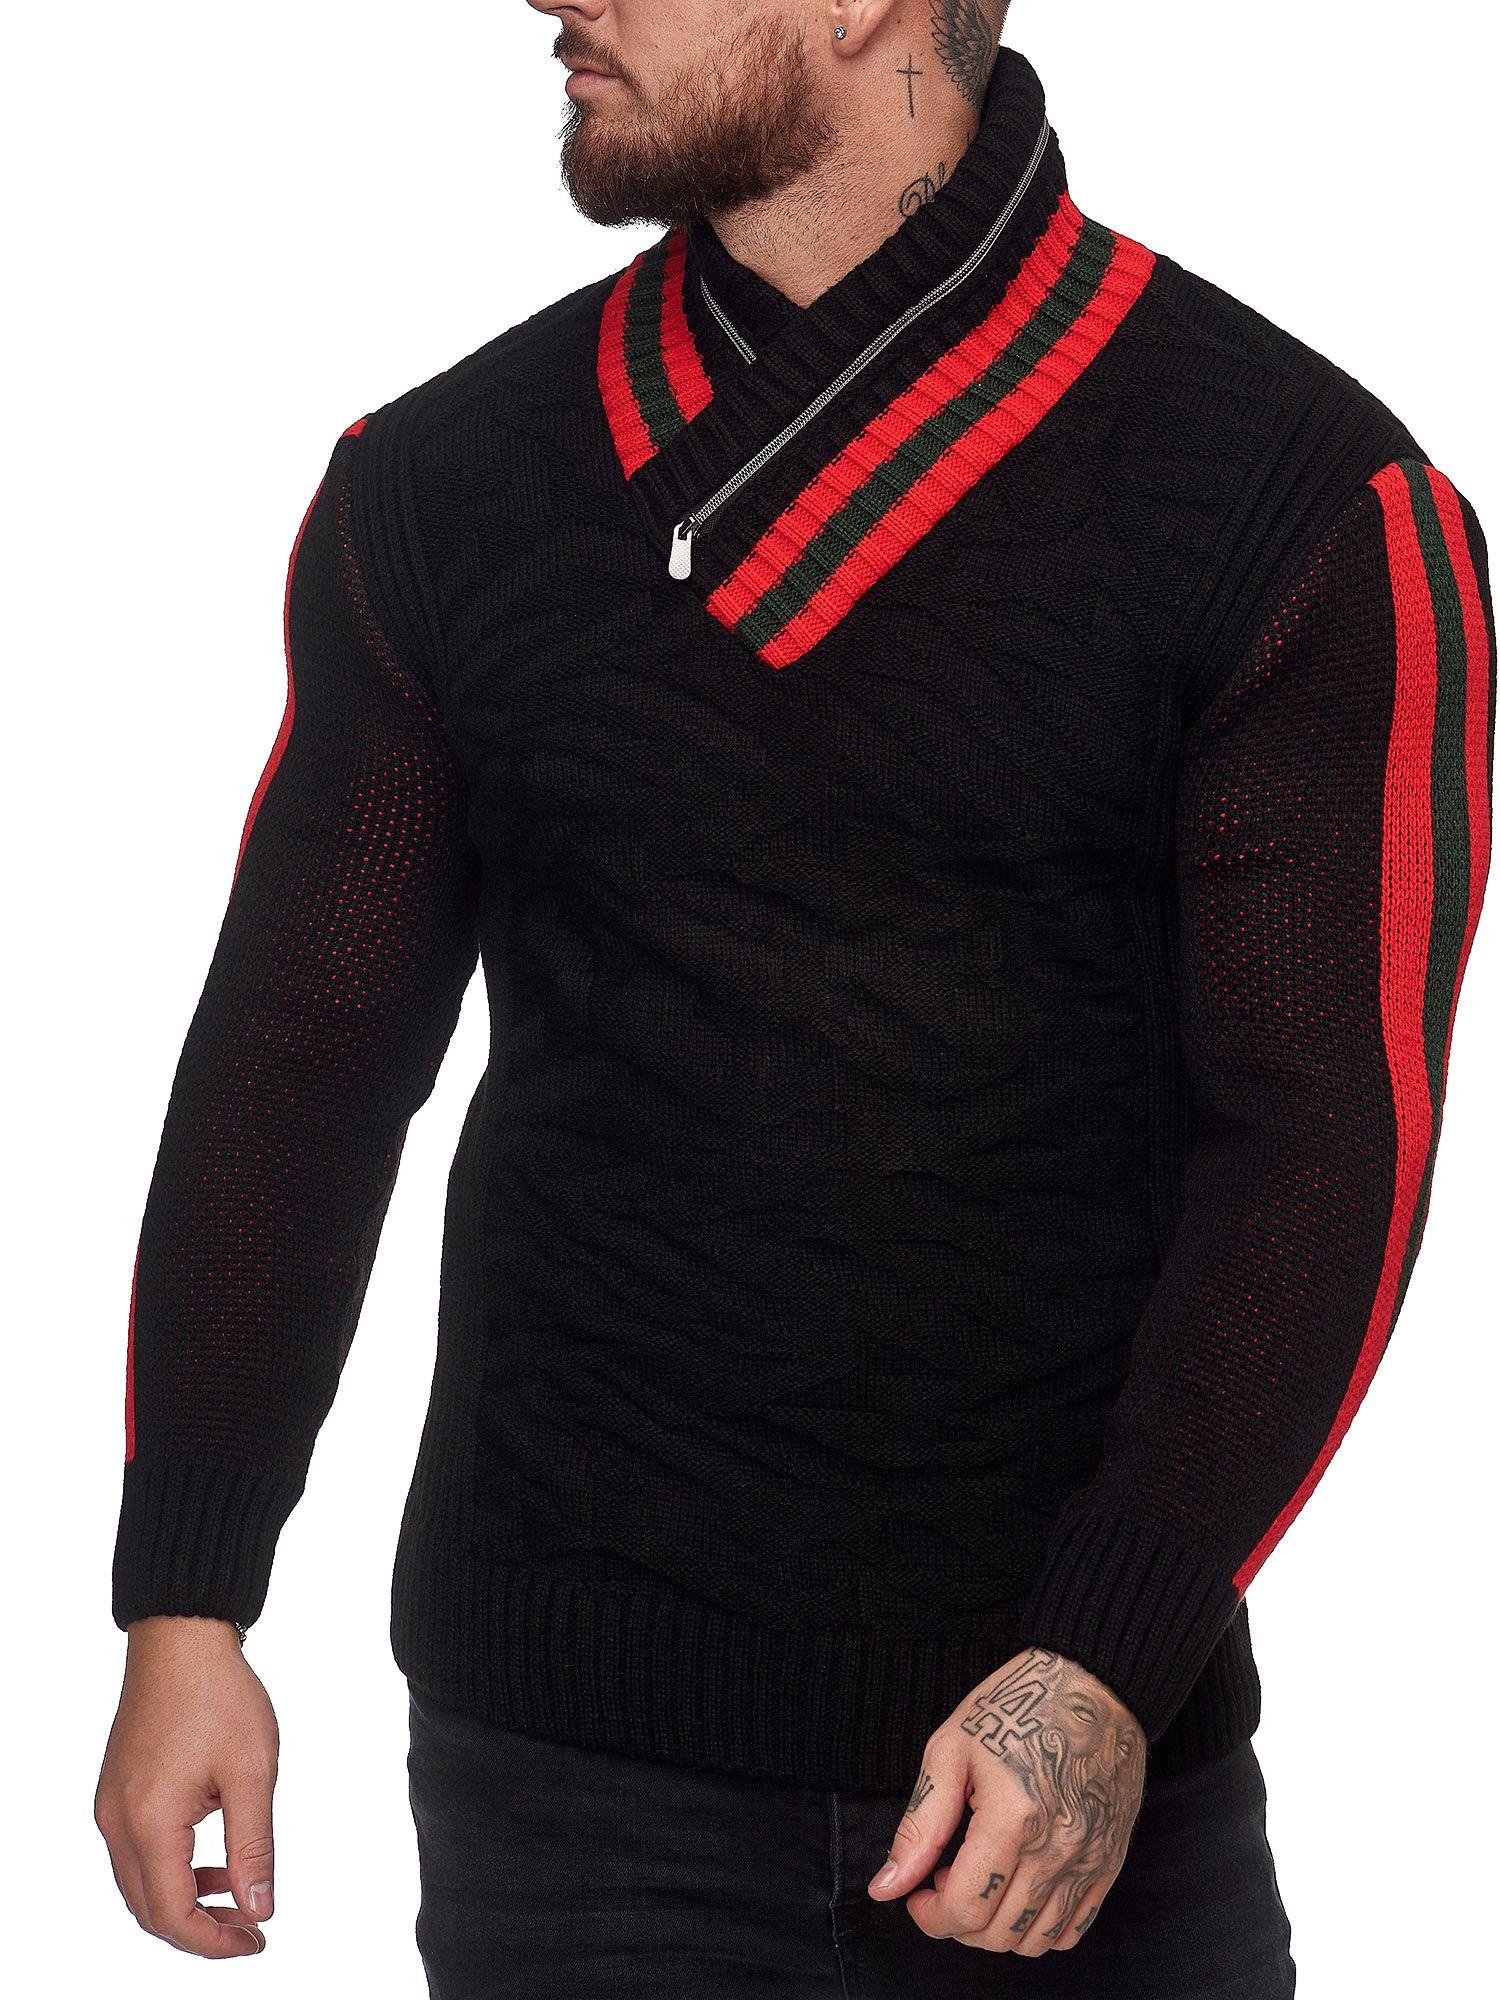 fashion menswear outfits Denim sweater mens men shirt hoodie wear style fashstop tracksuit vans converse street fash stop jeans ripped jeans denim shirts jacket hoodie bo...